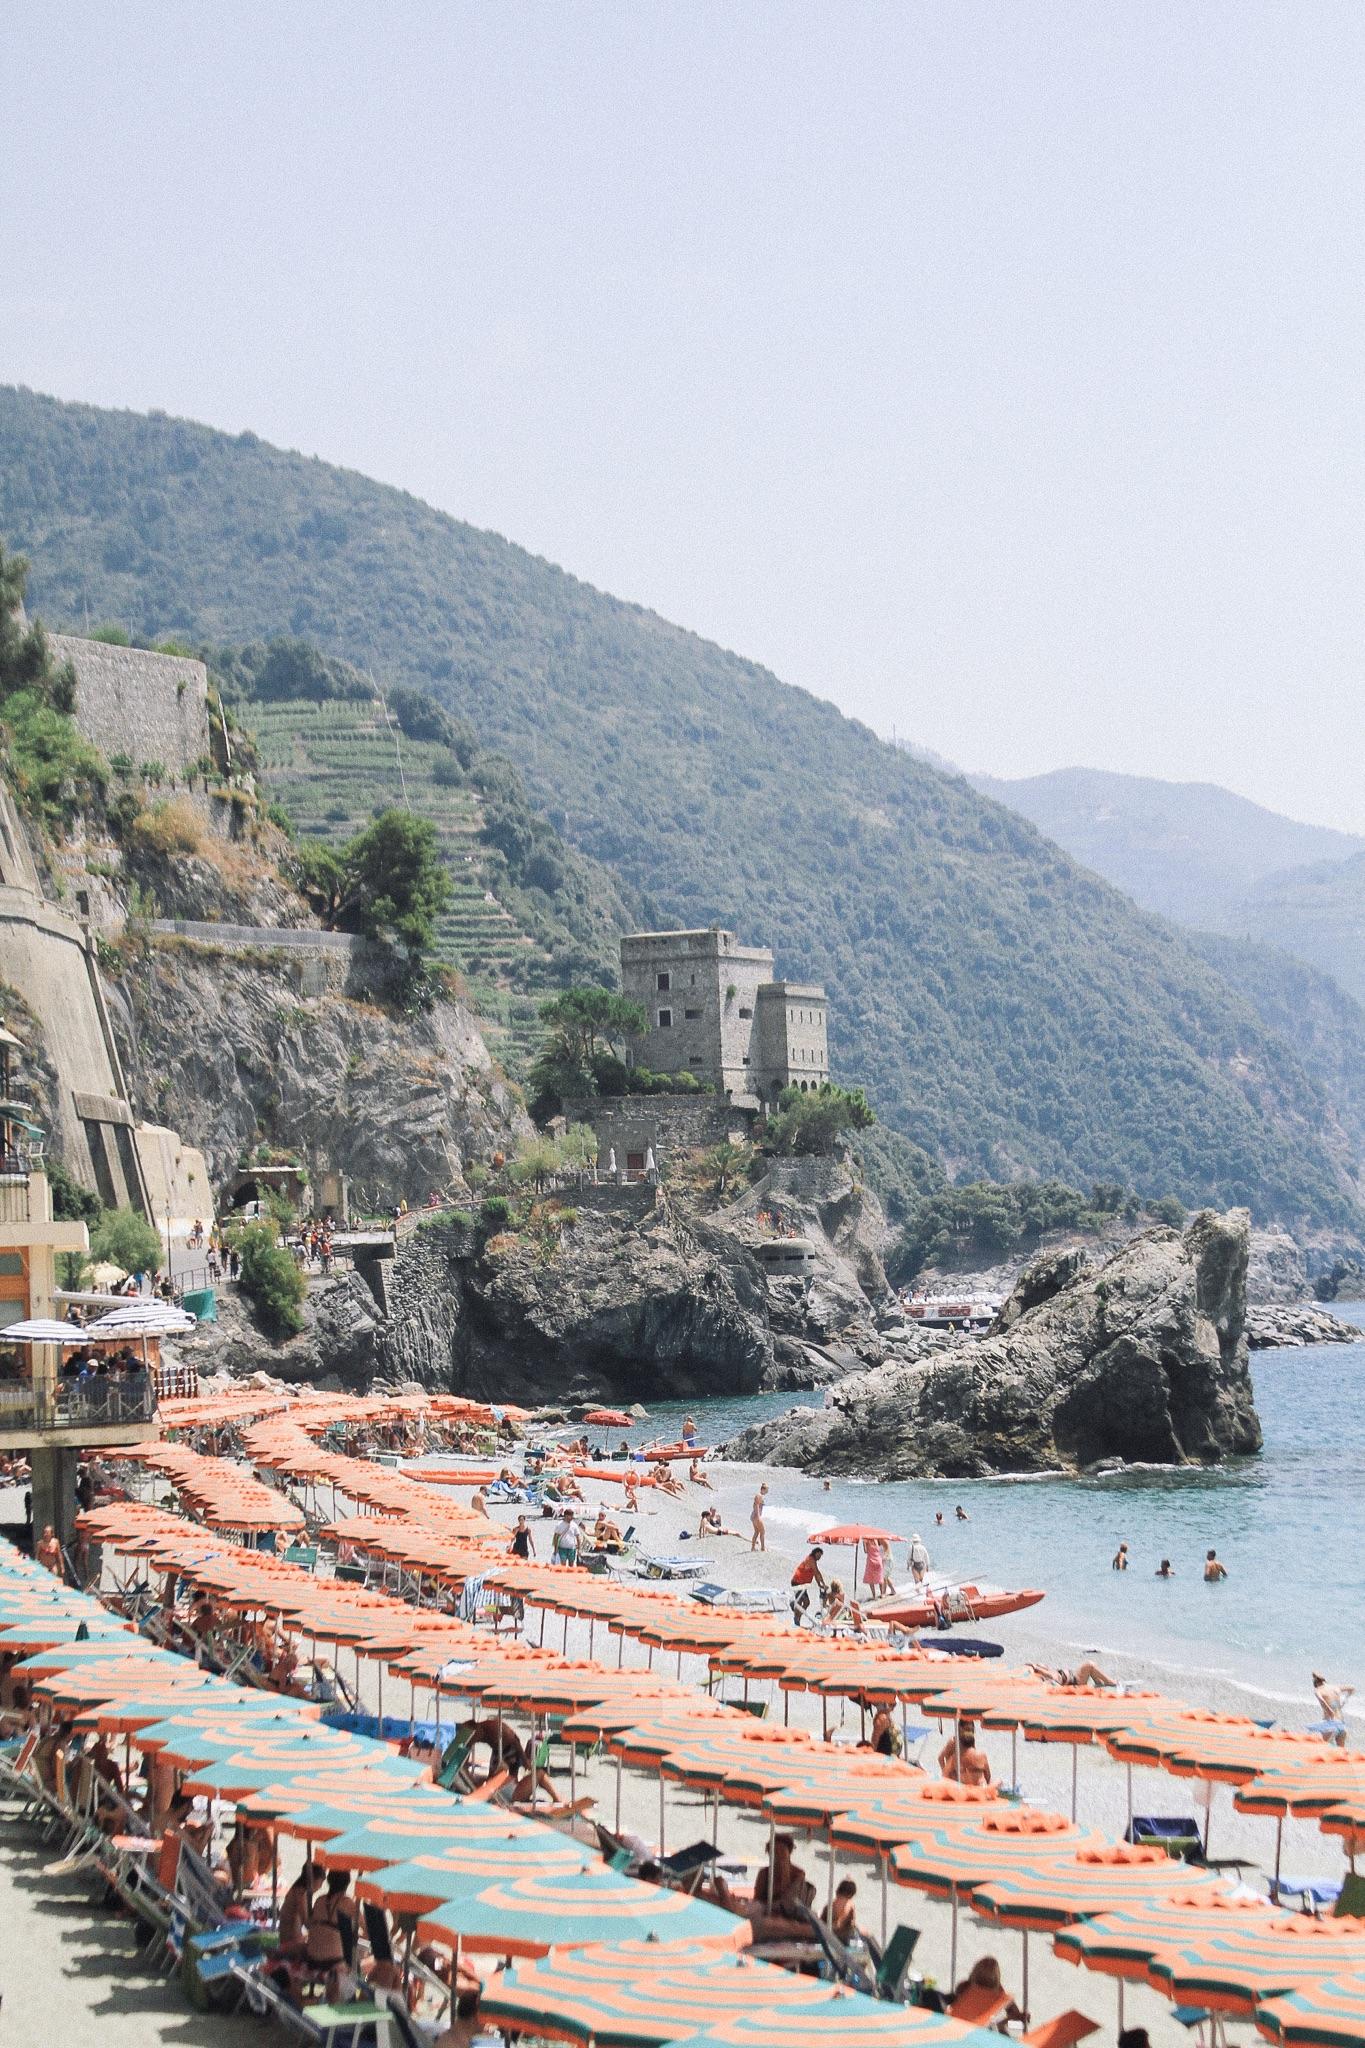 Ten-Days-Florence-Tuscany-Travel-Guide-MonicaFrancis-10